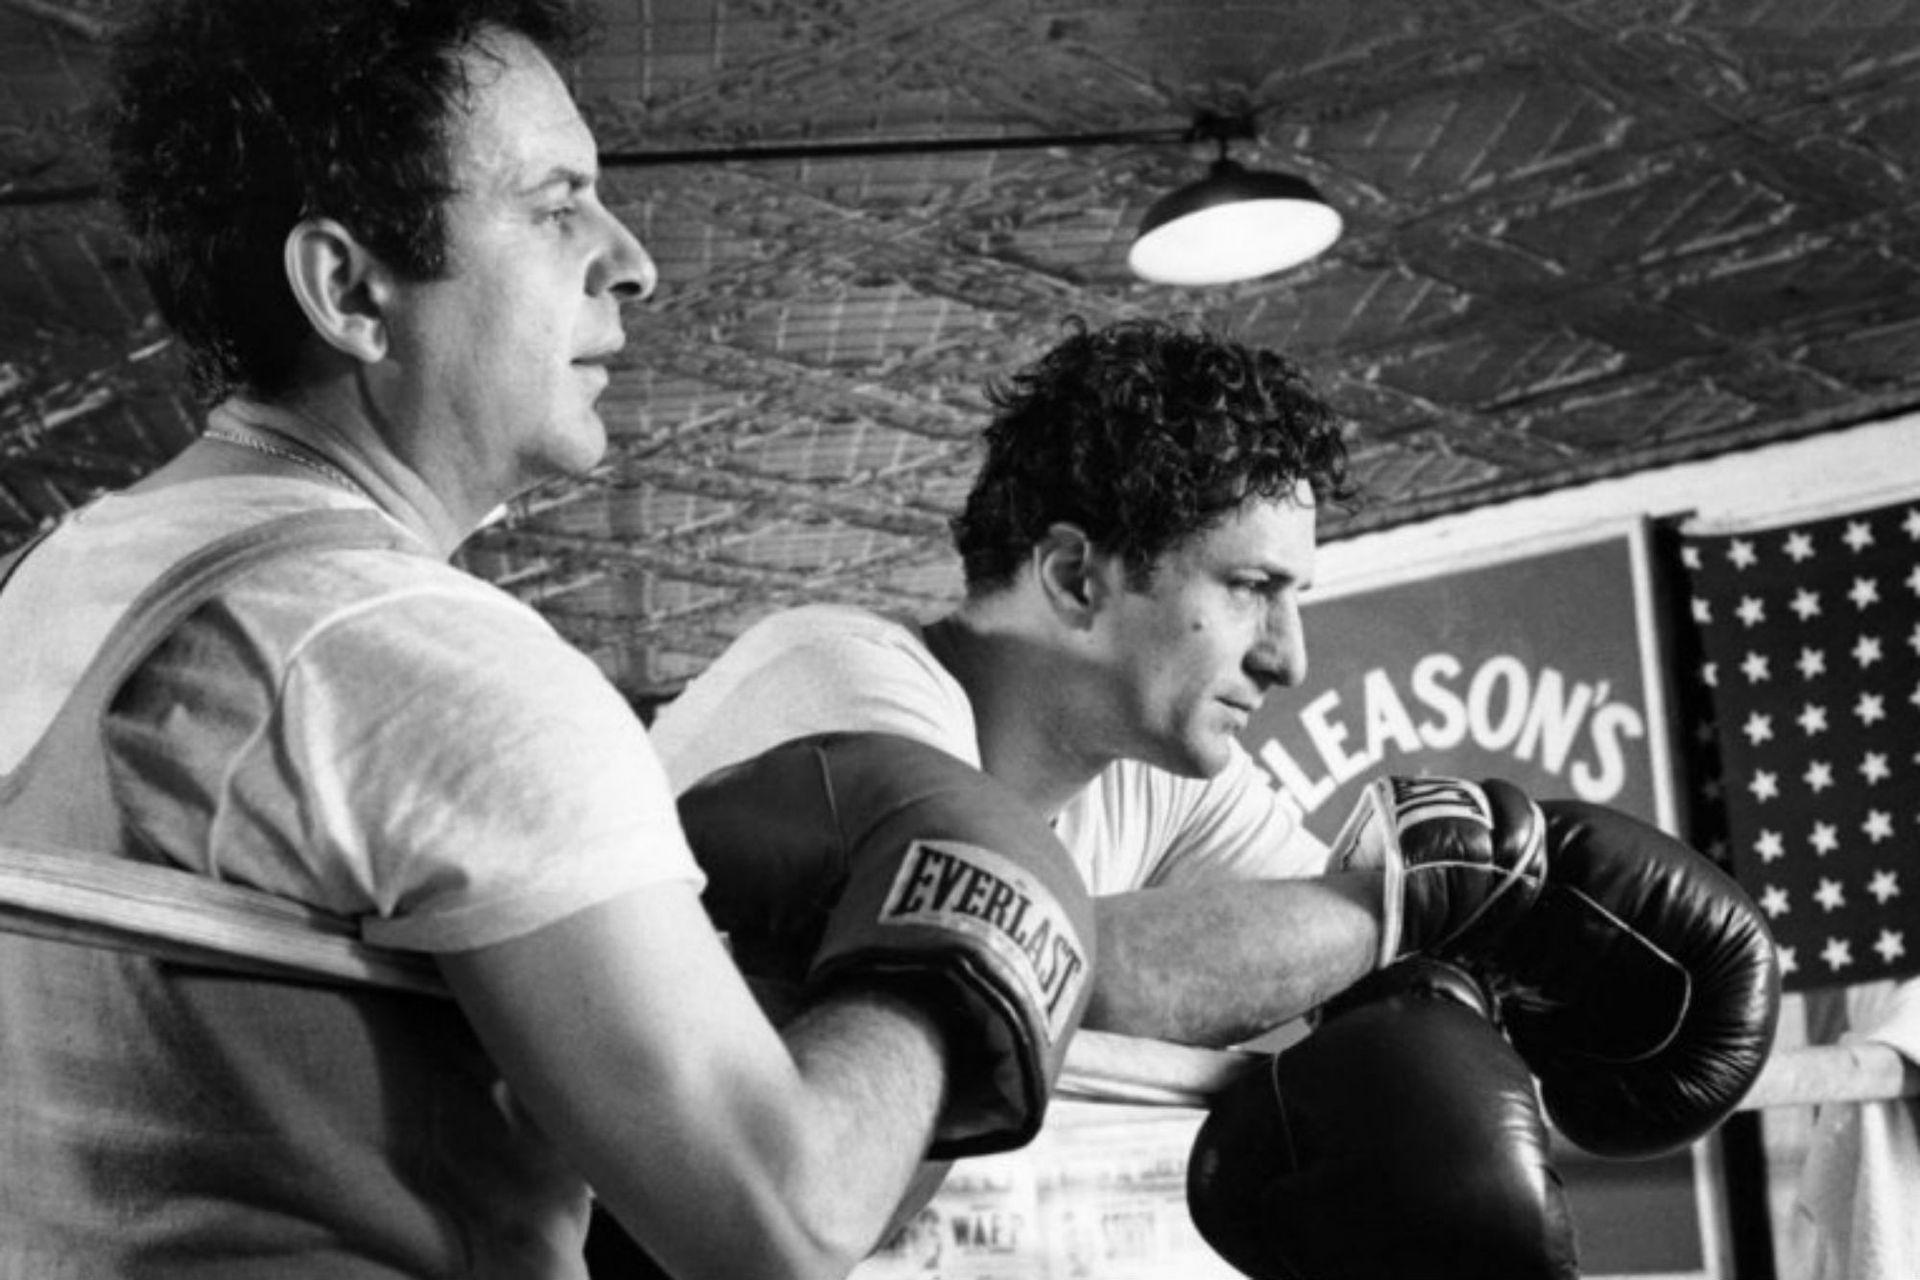 Joe Pesci y Robert De Niro como Joey y Jake LaMotta